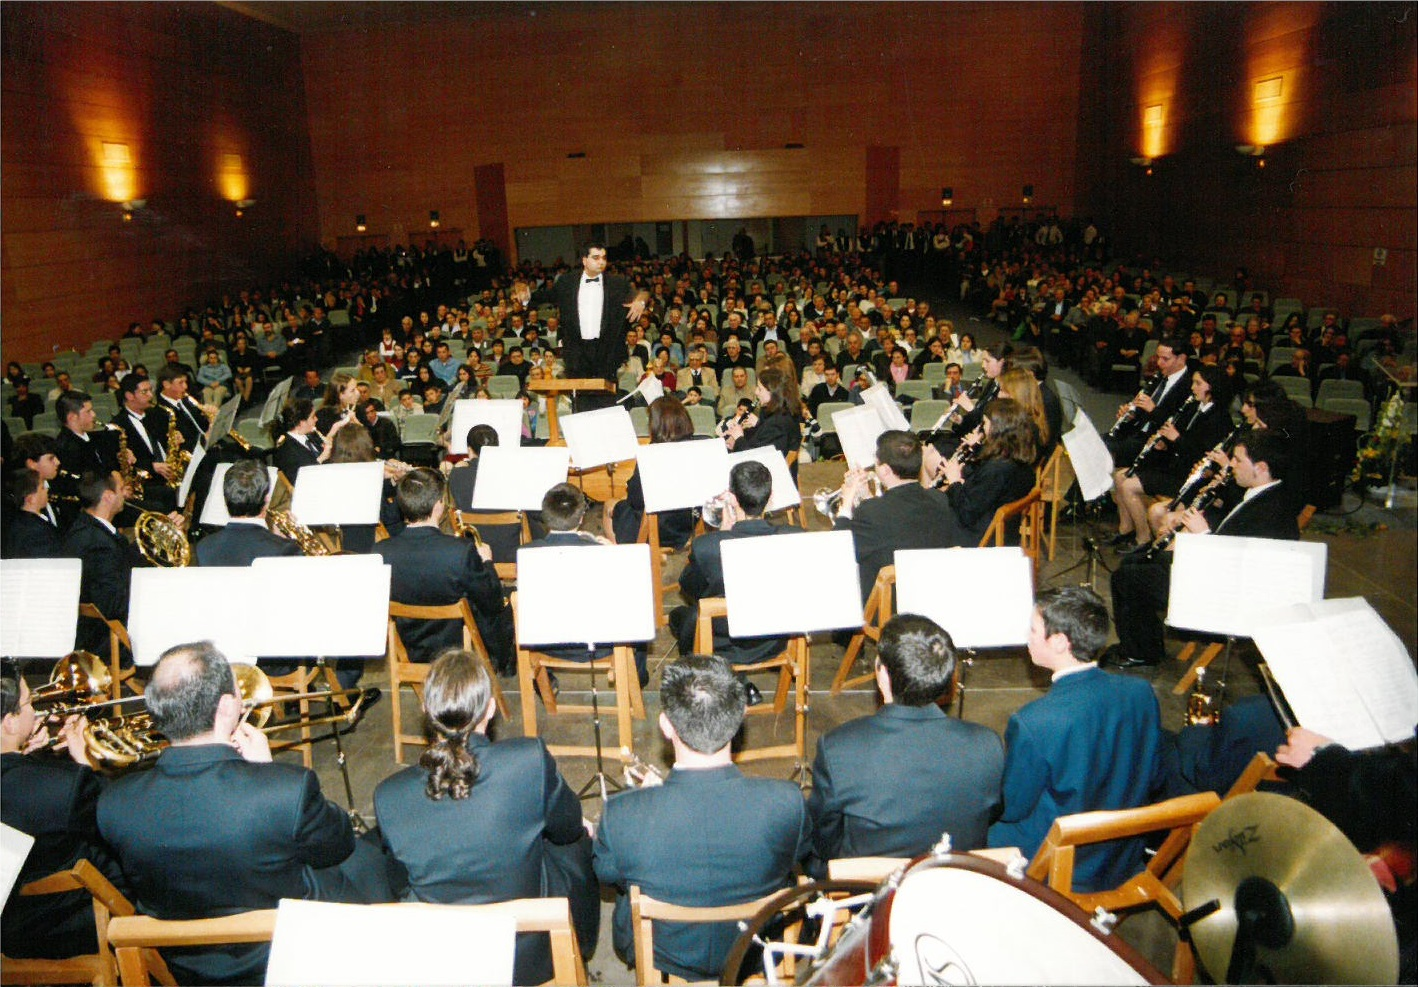 concerto-auditorio-semana-verde-silleda-31-03-2001-04